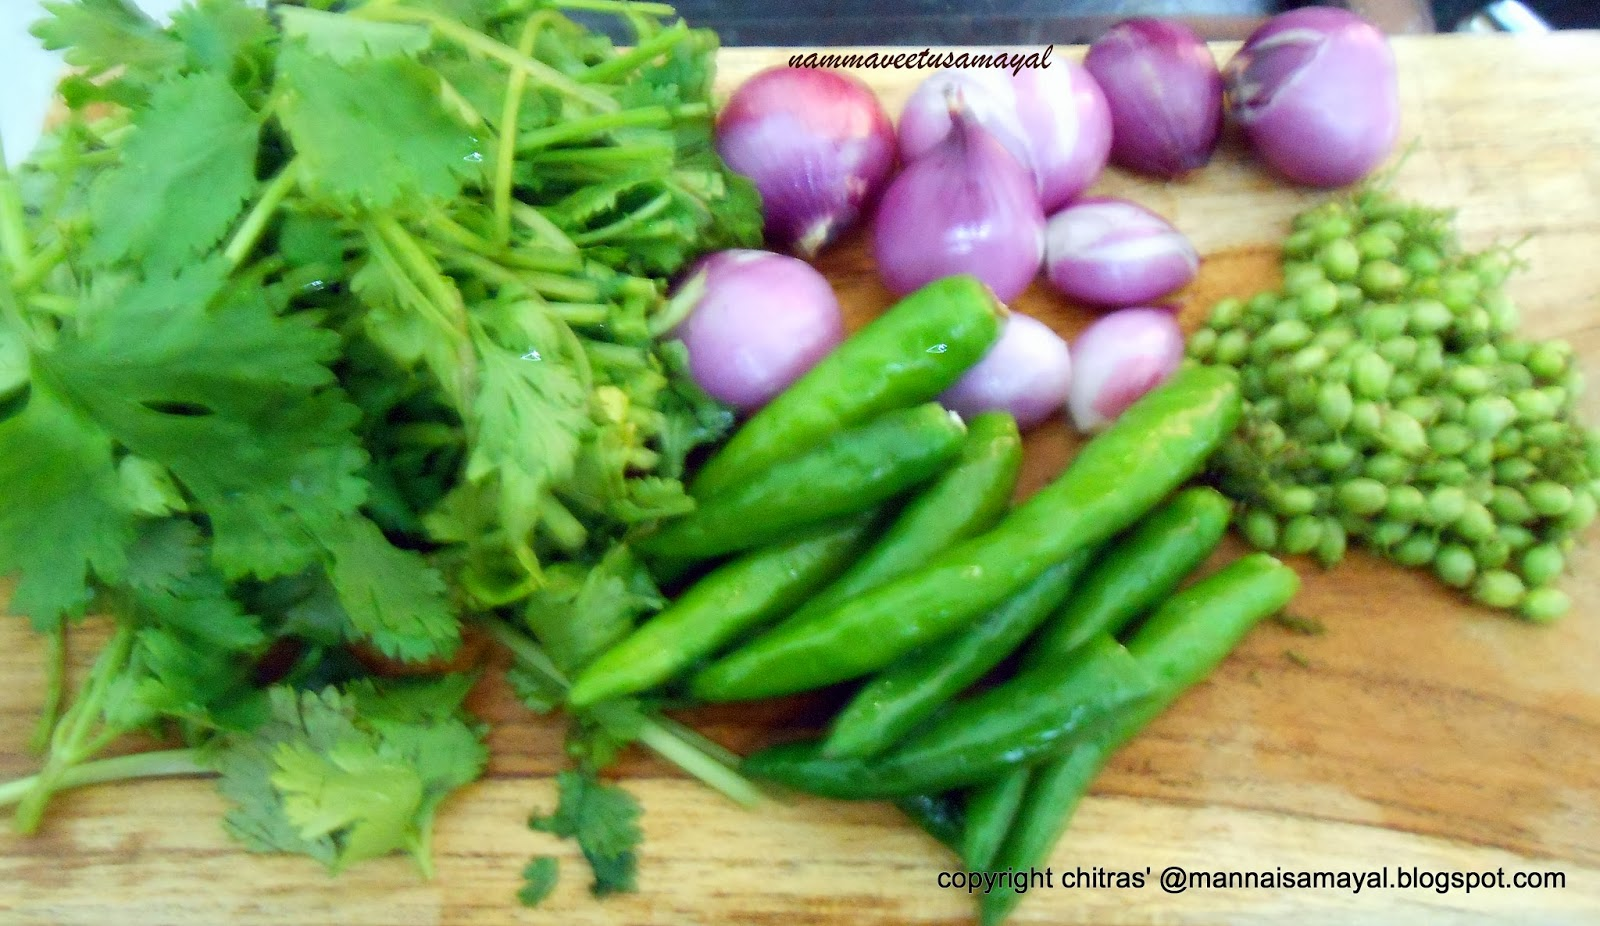 Green Coriander seeds Chutney